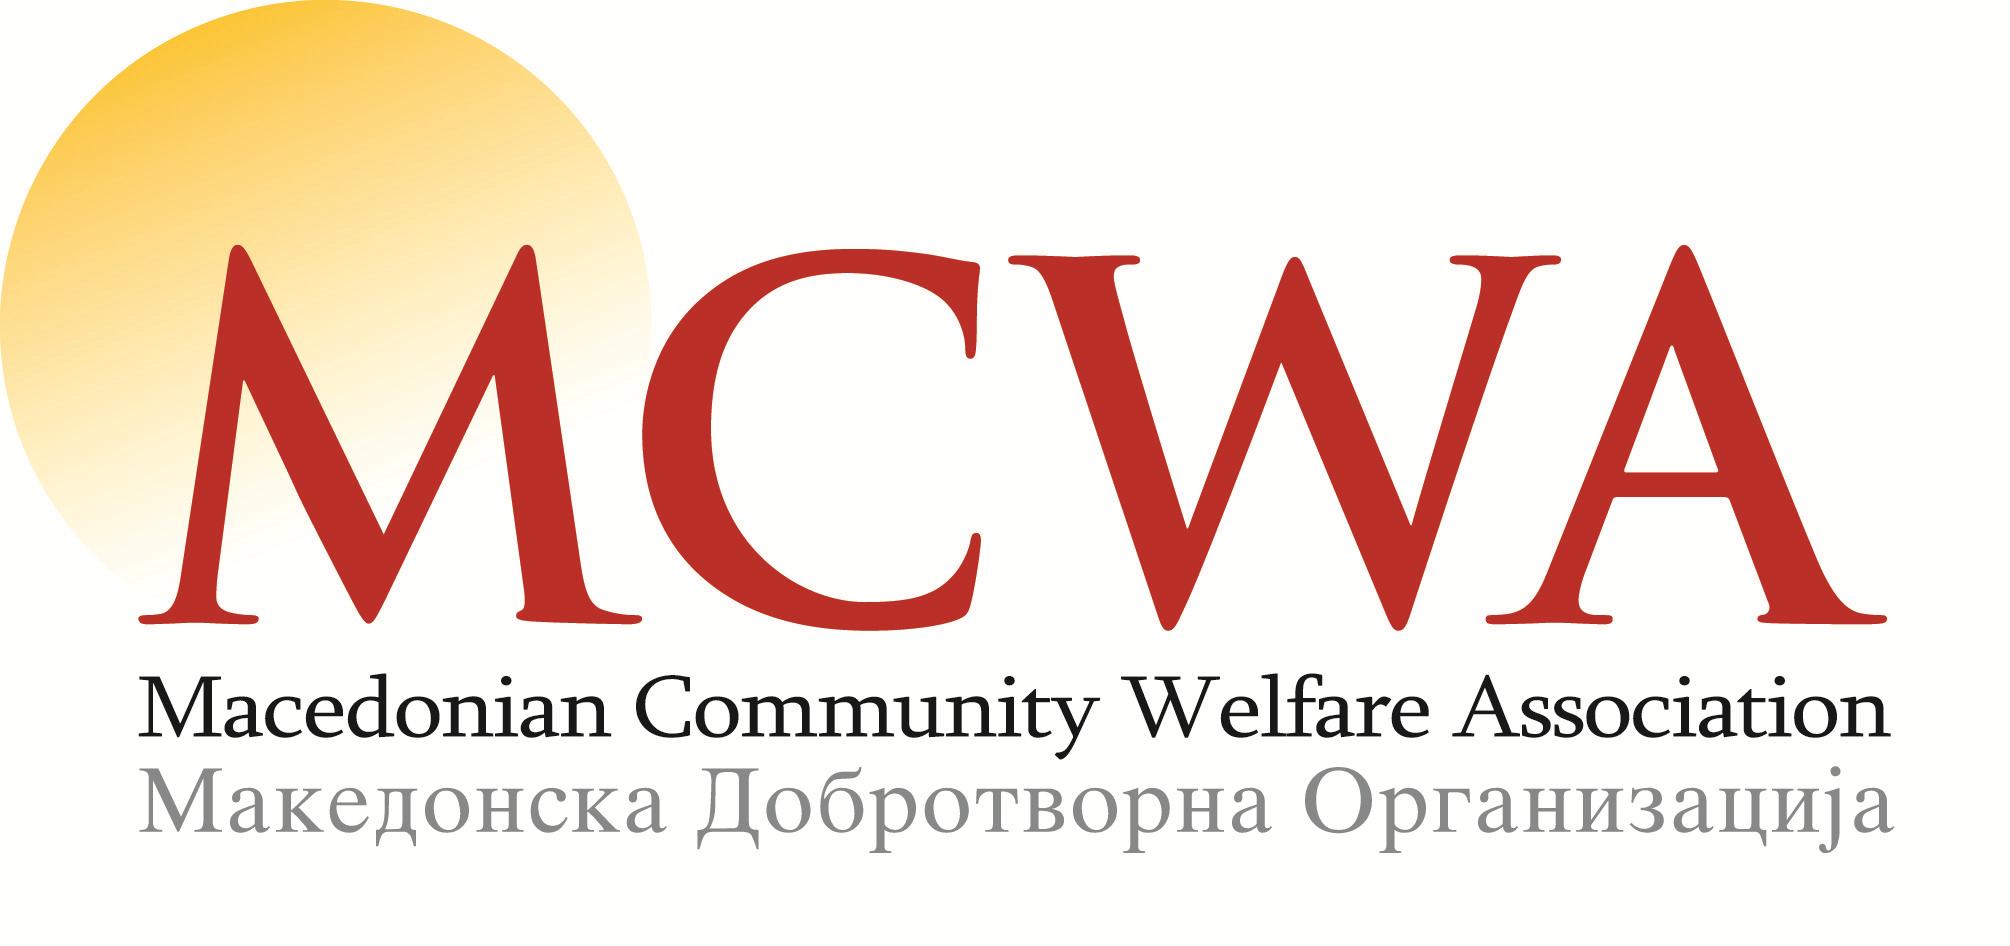 Macedonian Community Welfare Association